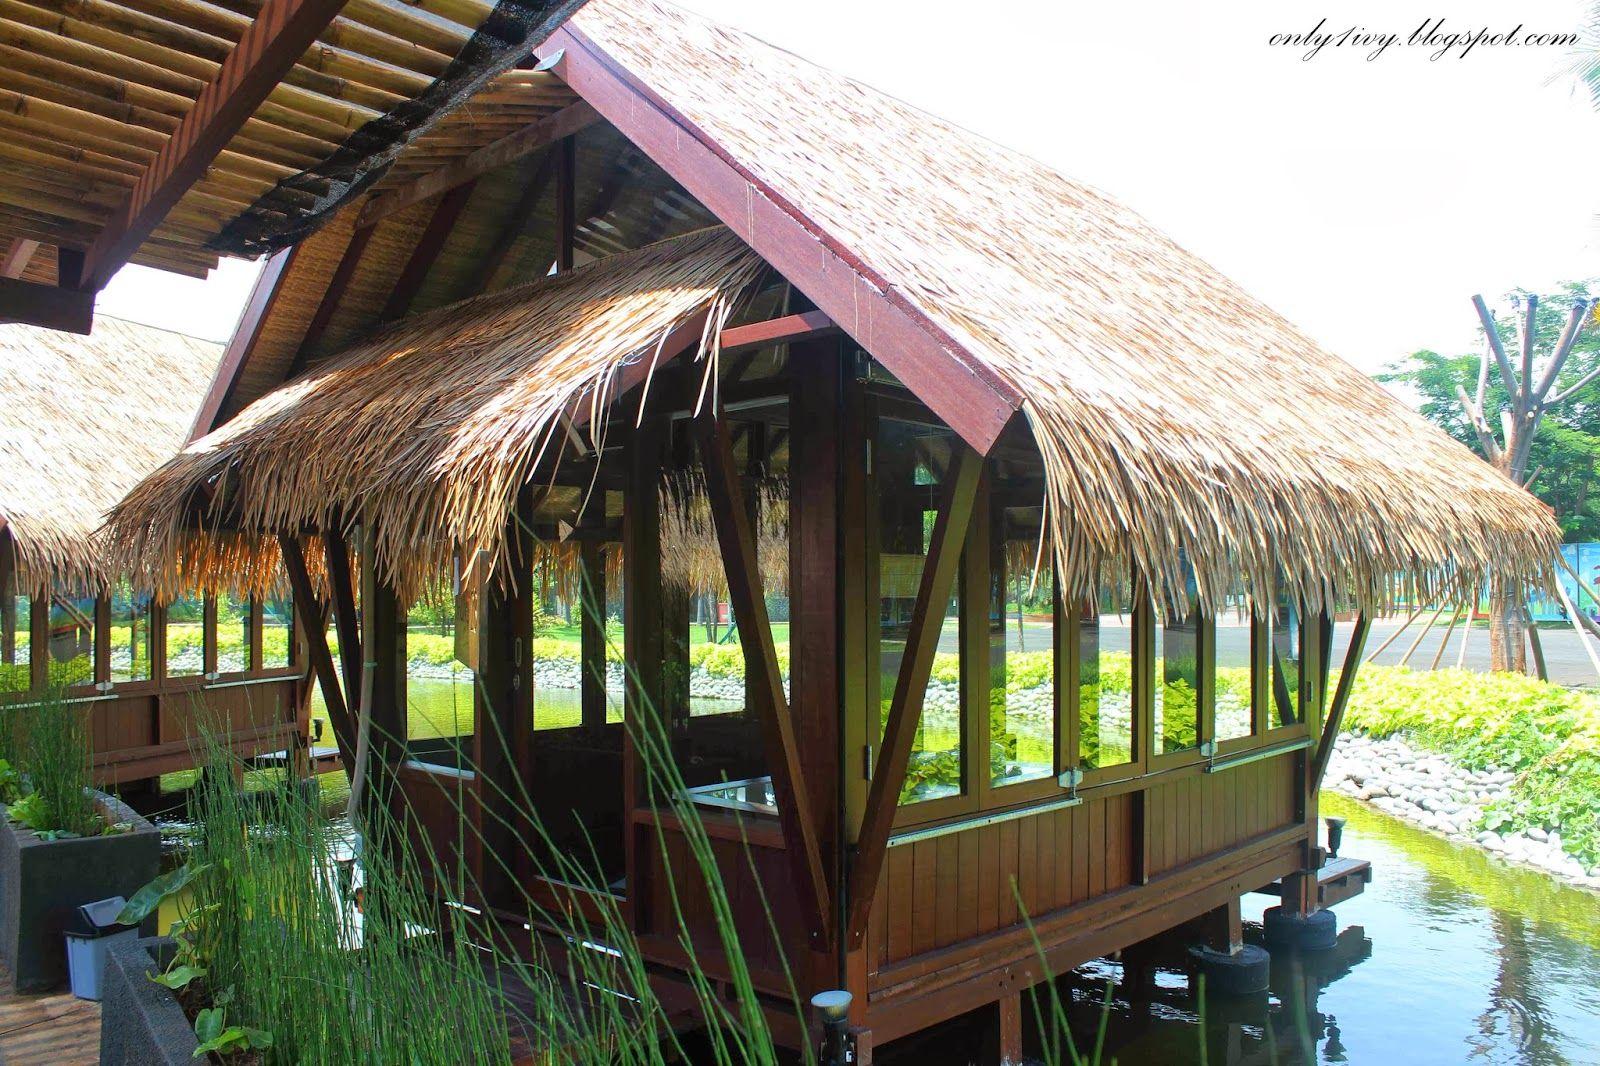 Ivy S Life Talaga Sampireun Ancol Ancol Outdoor Structures Outdoor